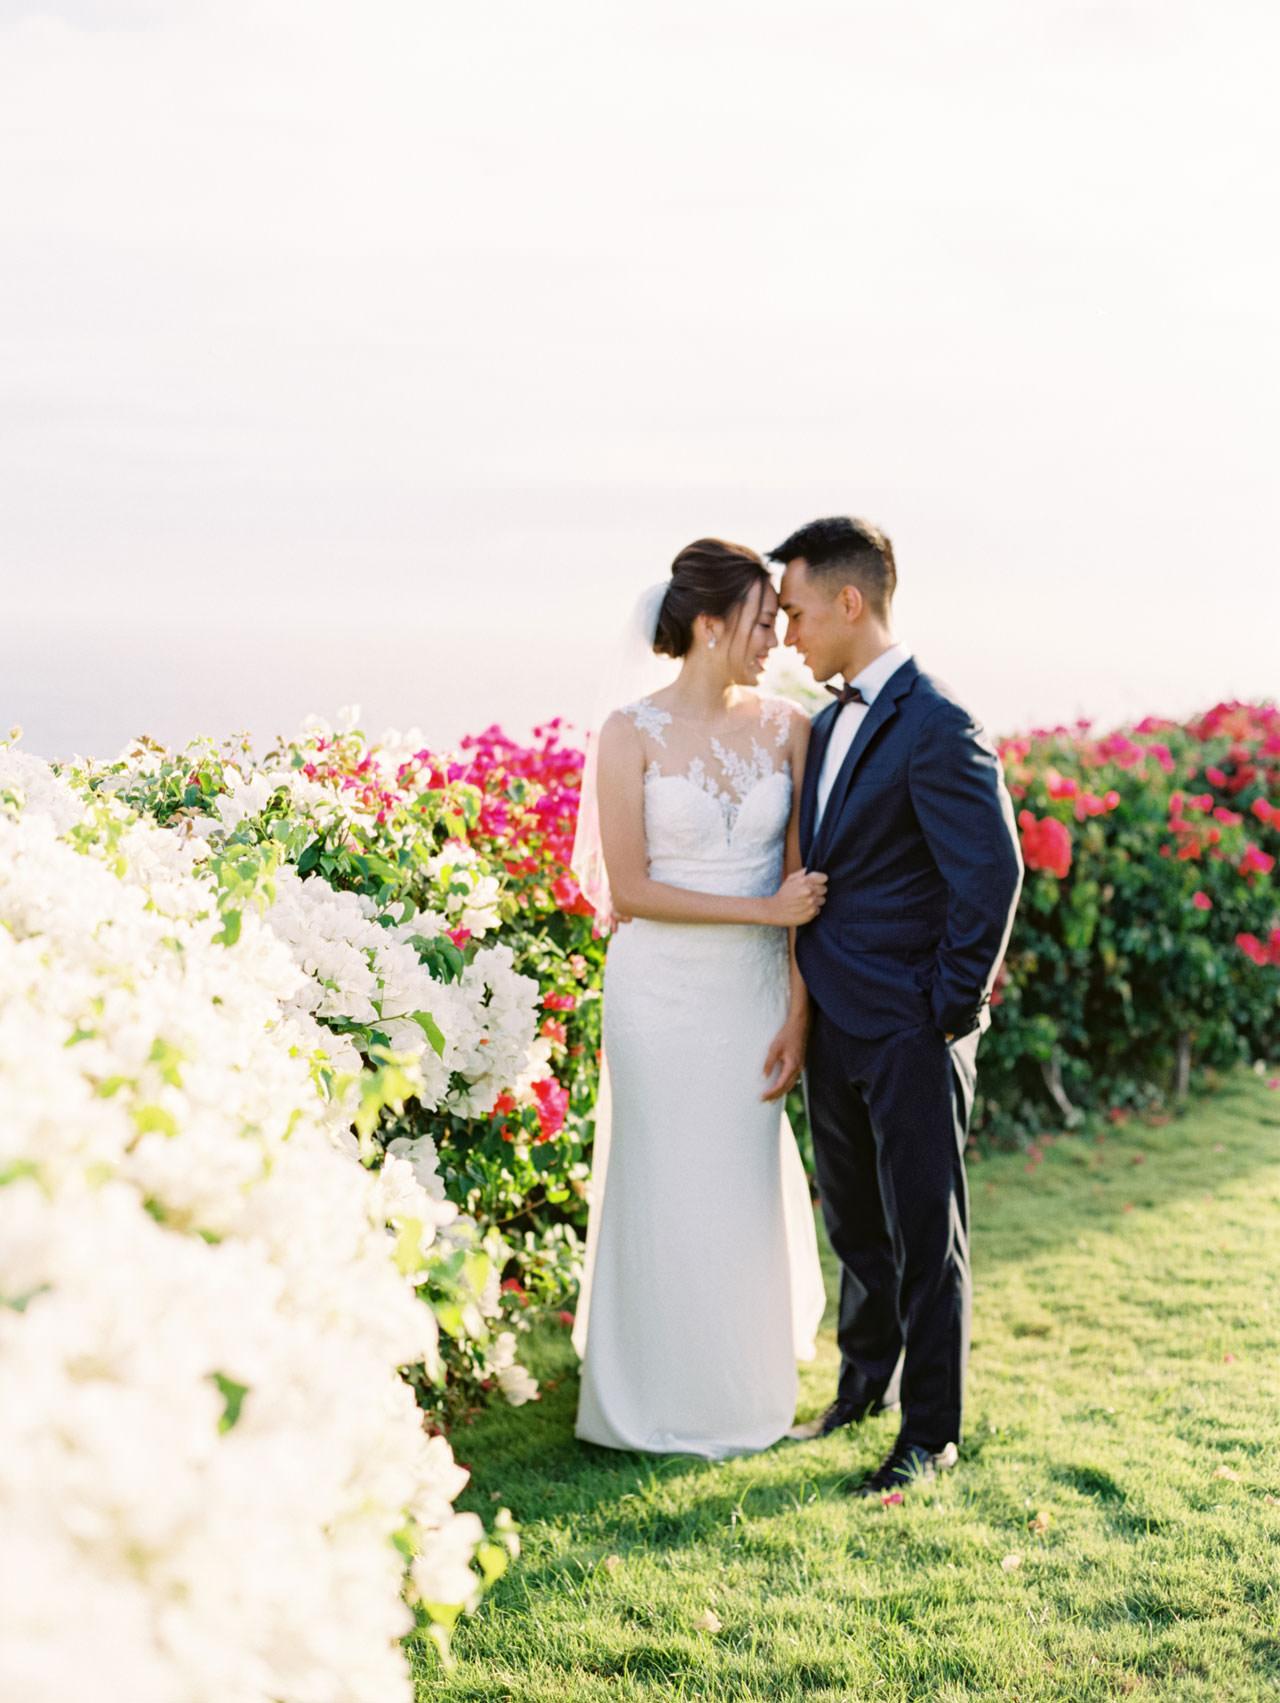 Uluwatu Cliff Wedding with Chinese Wedding Ceremony 28